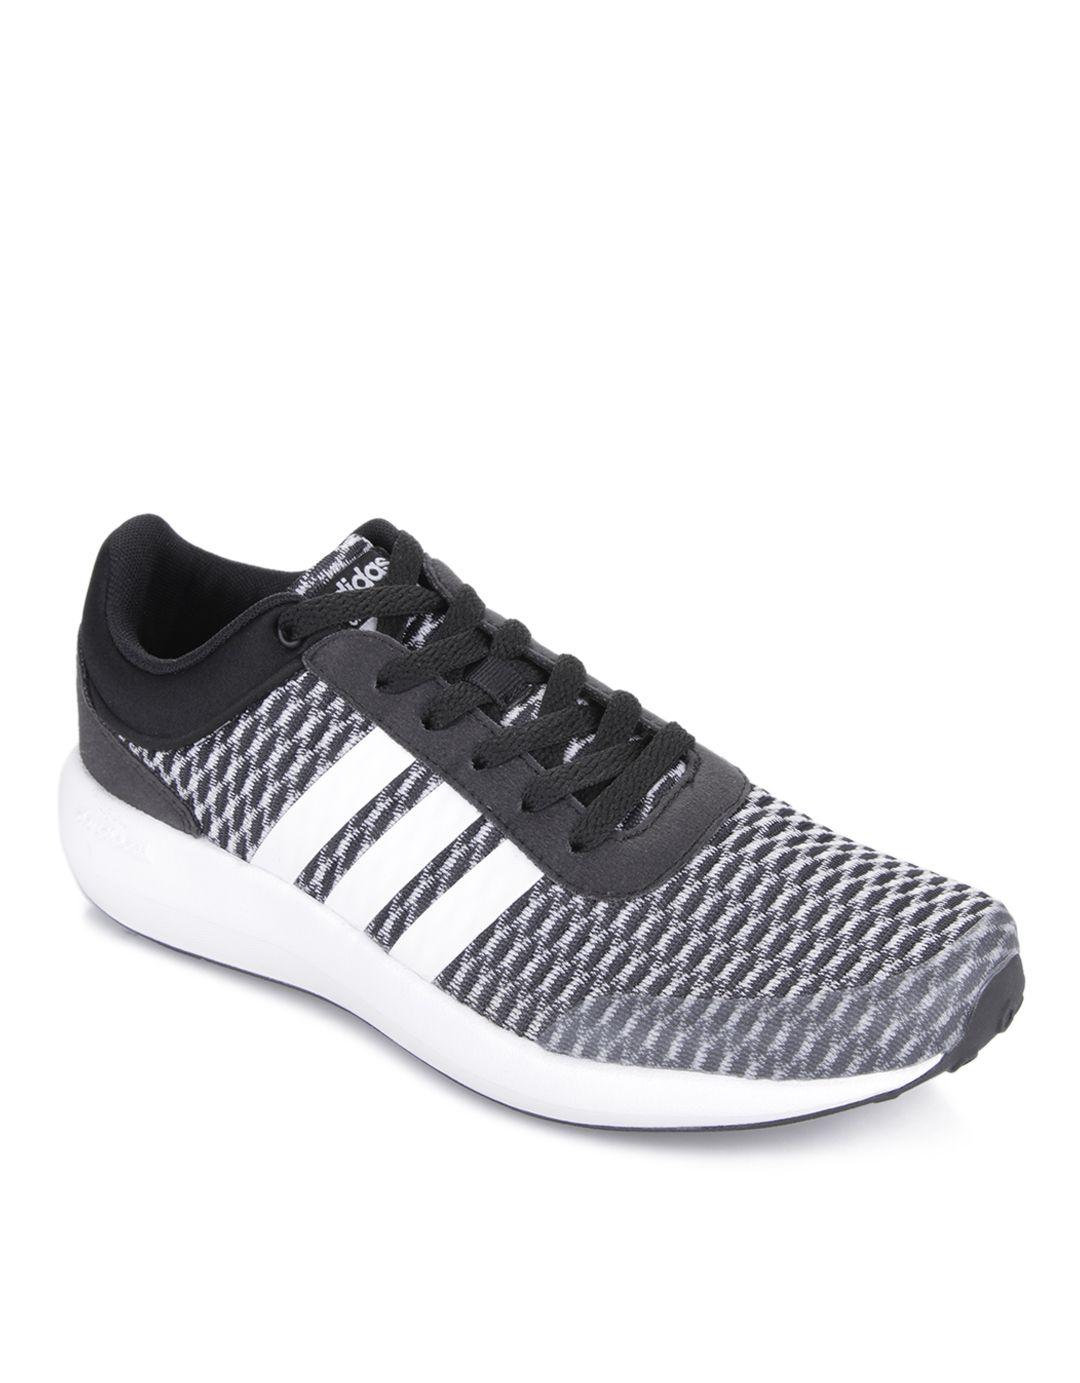 Cloudfoam Race Women S Shoes Dari Adidas Sepatu Olahraga Pilihan